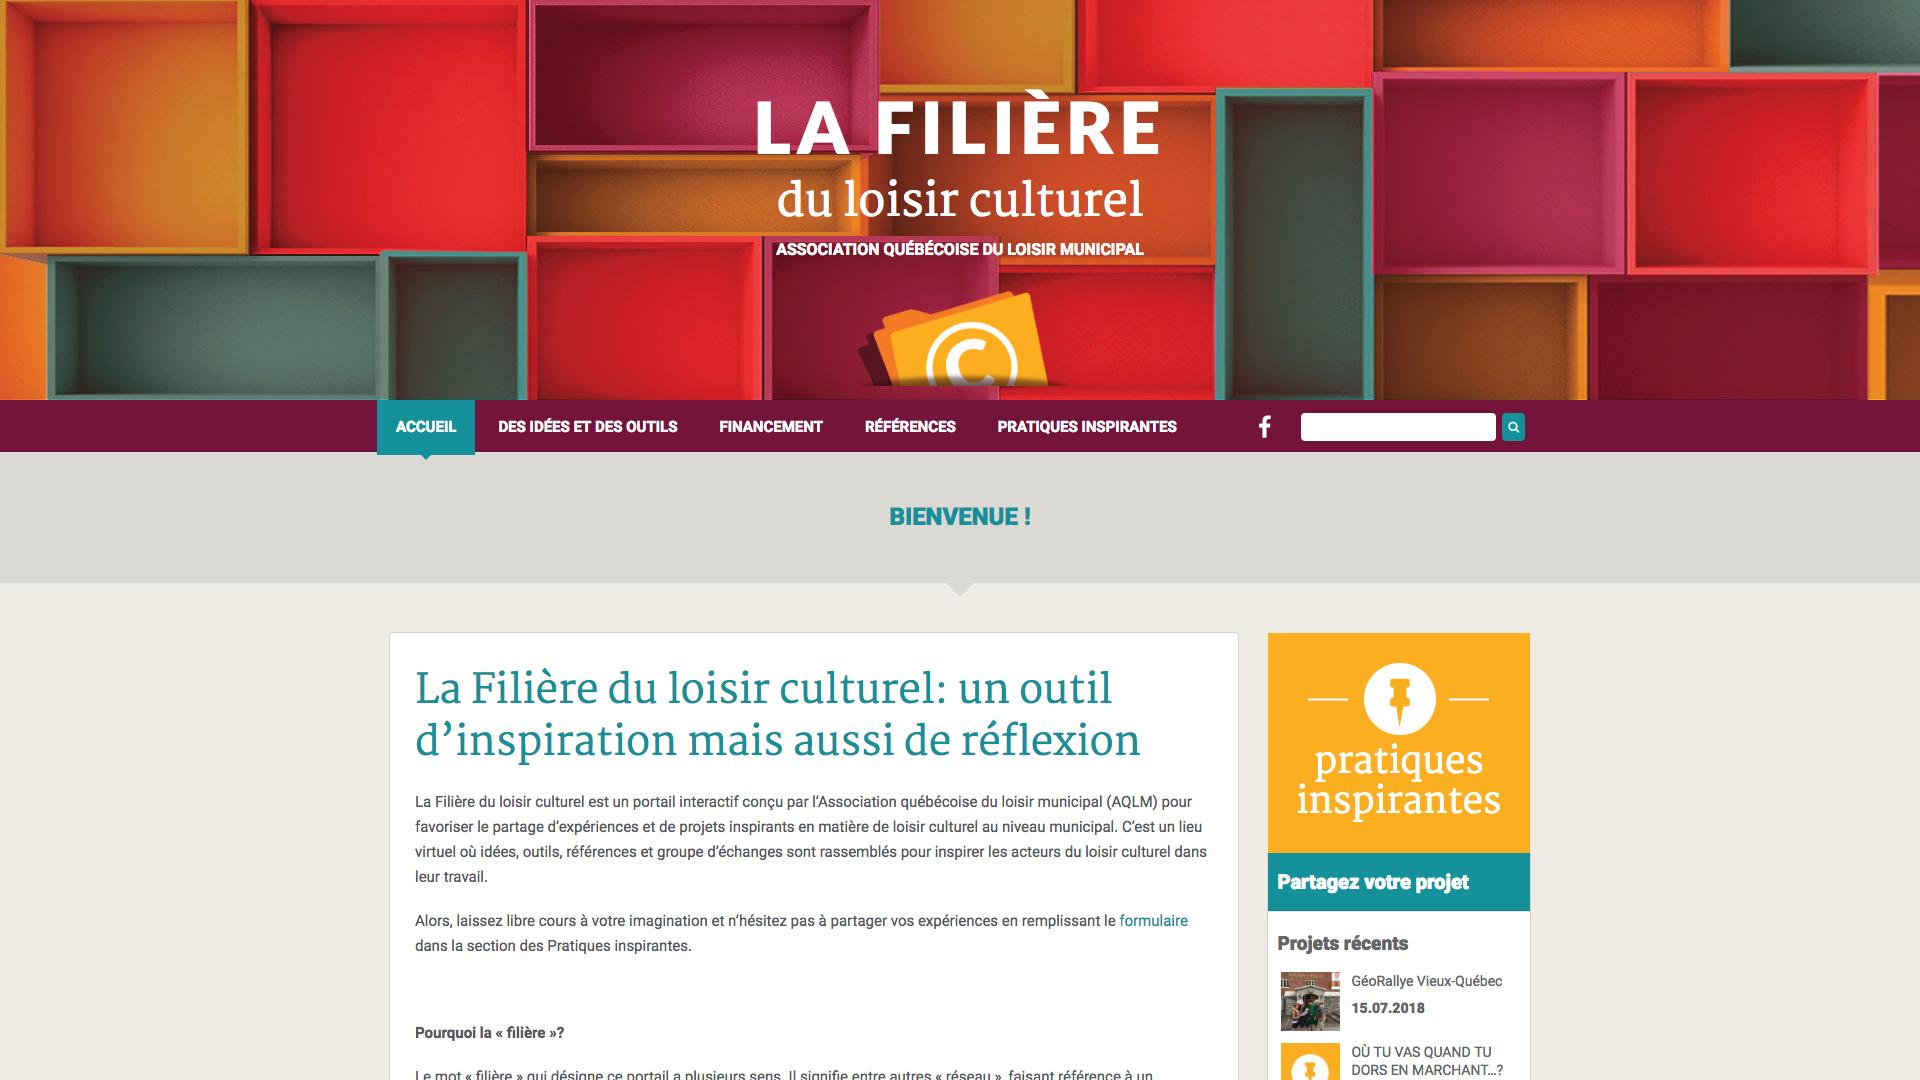 LA FILIÈRE du loisir culturel